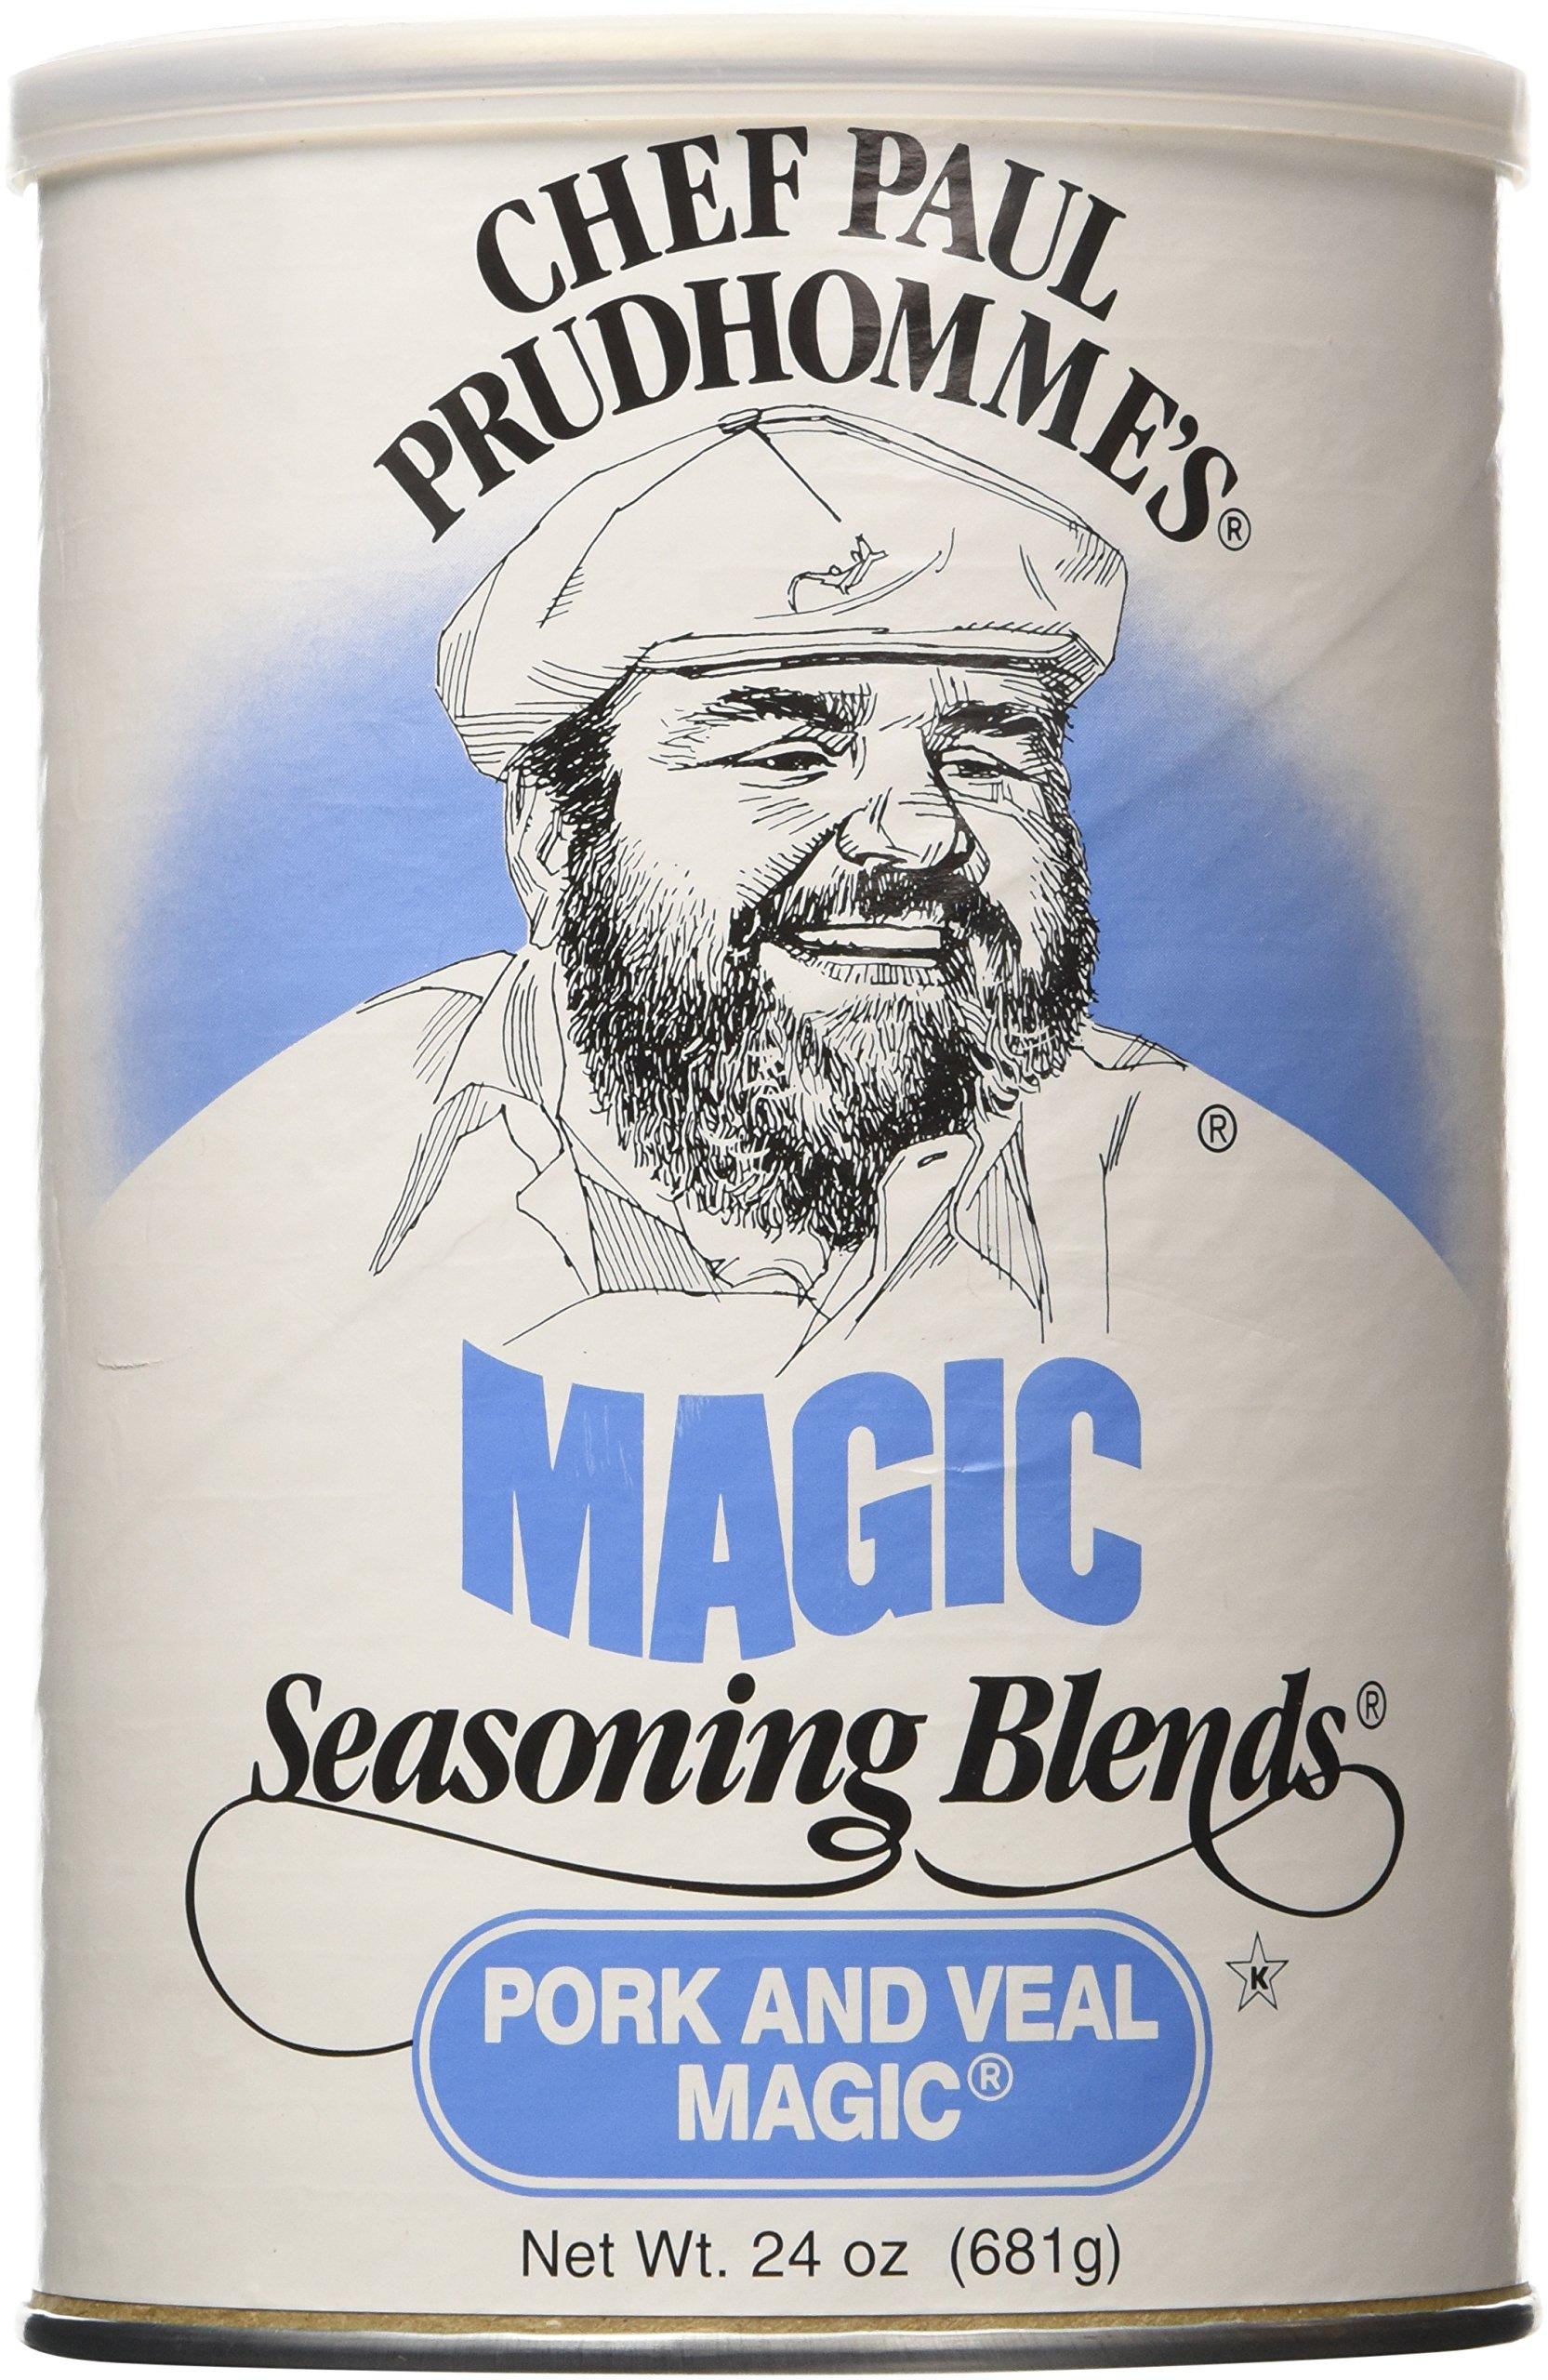 Pork and Veal Magic Seasoning 24oz by Magic Seasoning Blends